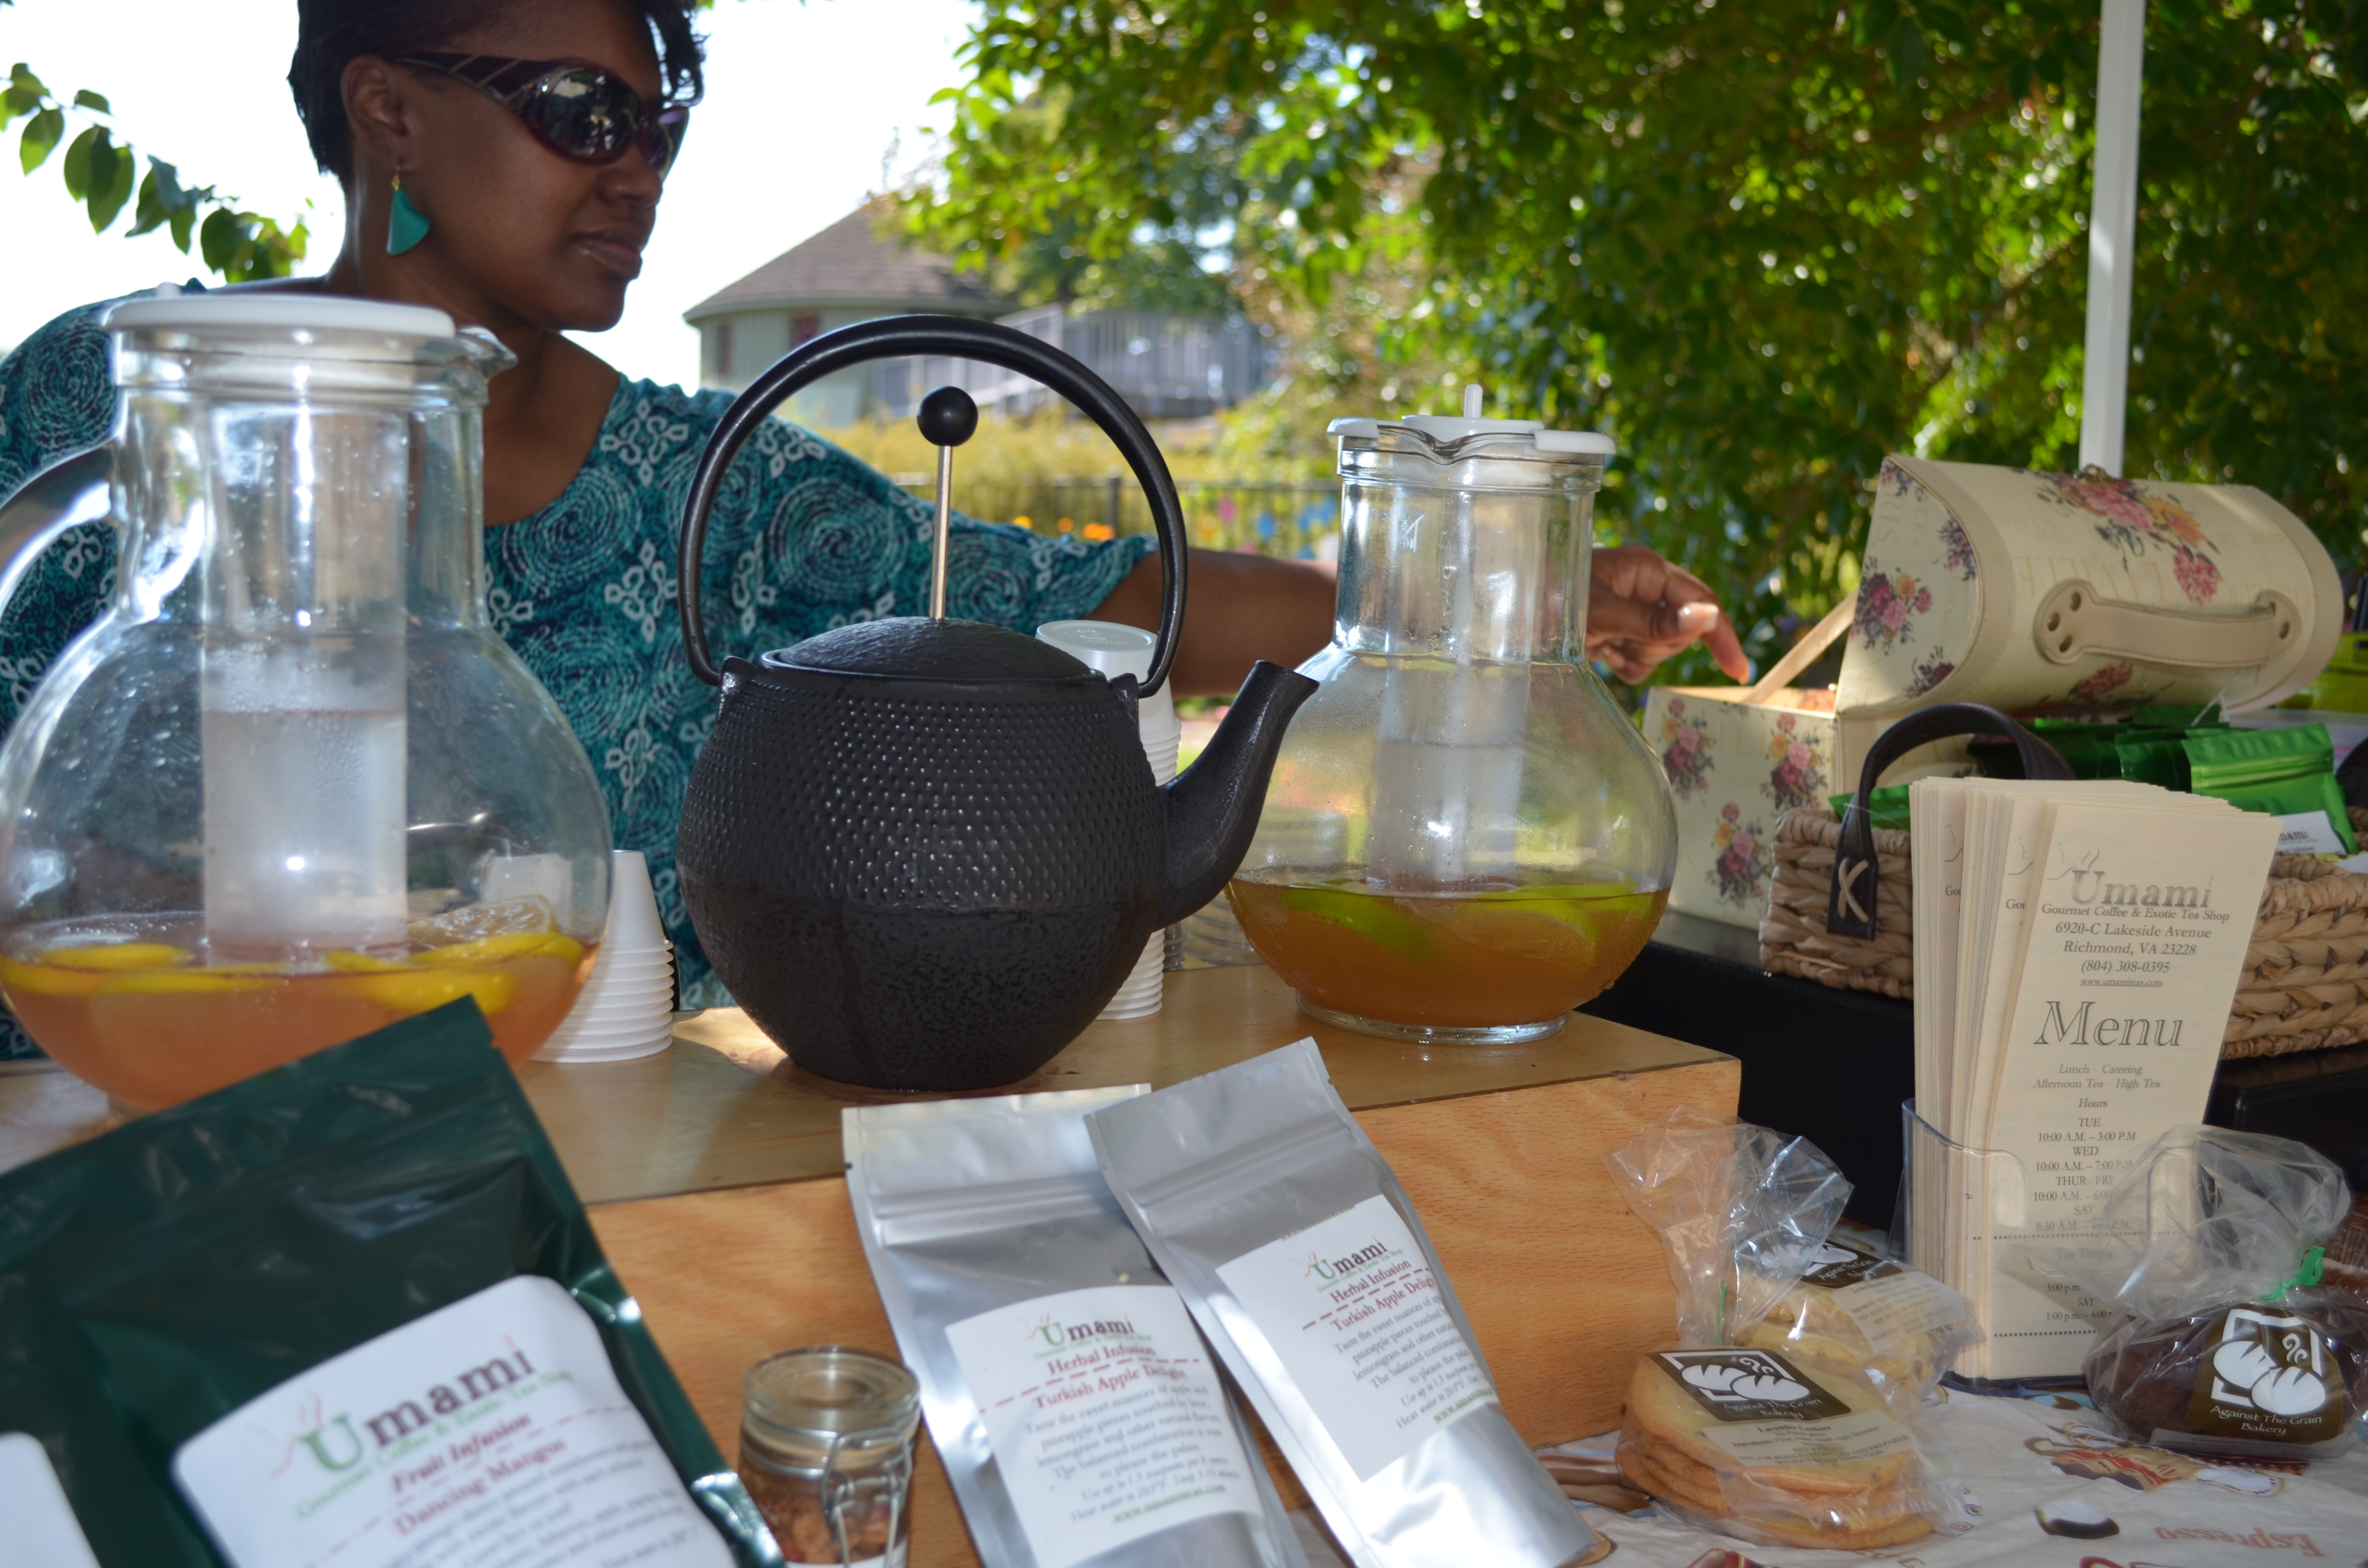 Umami Tea and Coffee Richmond Virginia